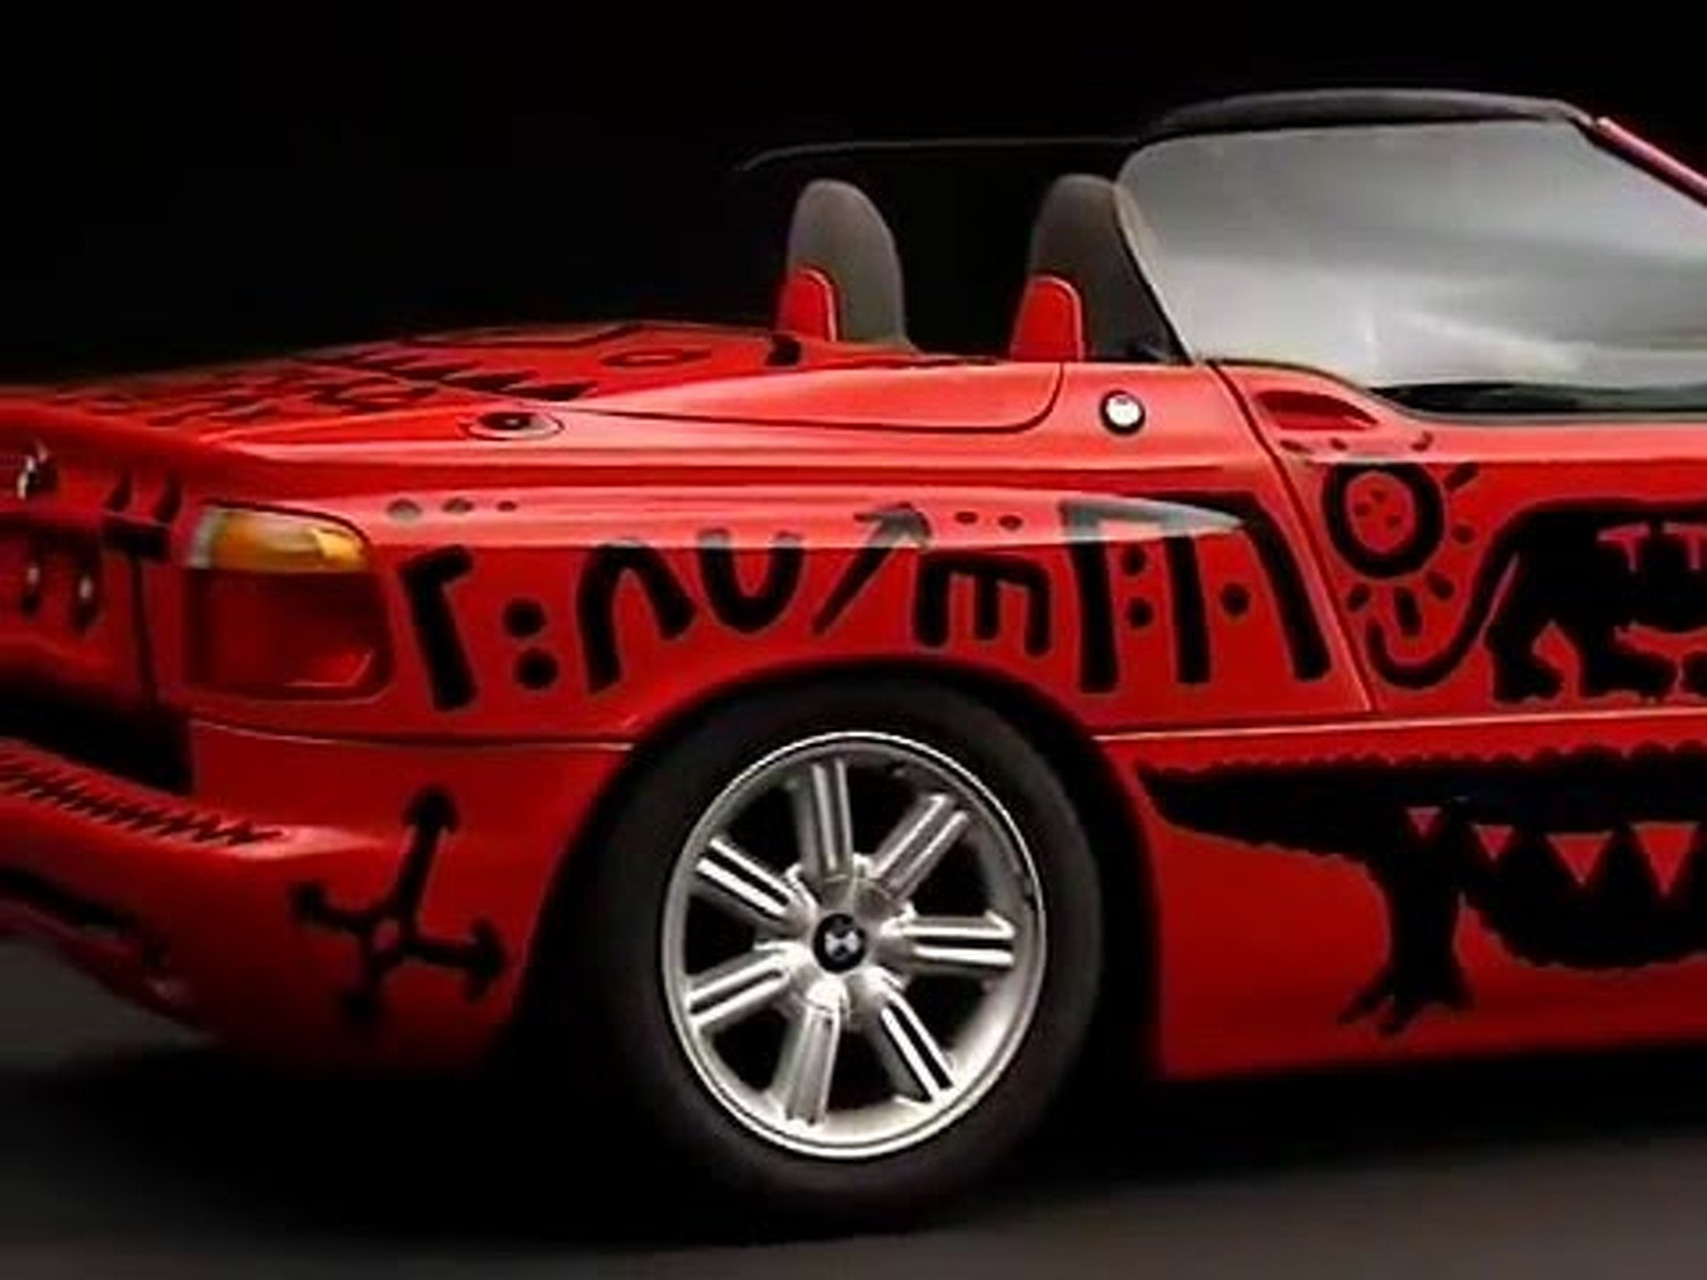 BMW Z1 Art Car von AR Penck, 1991